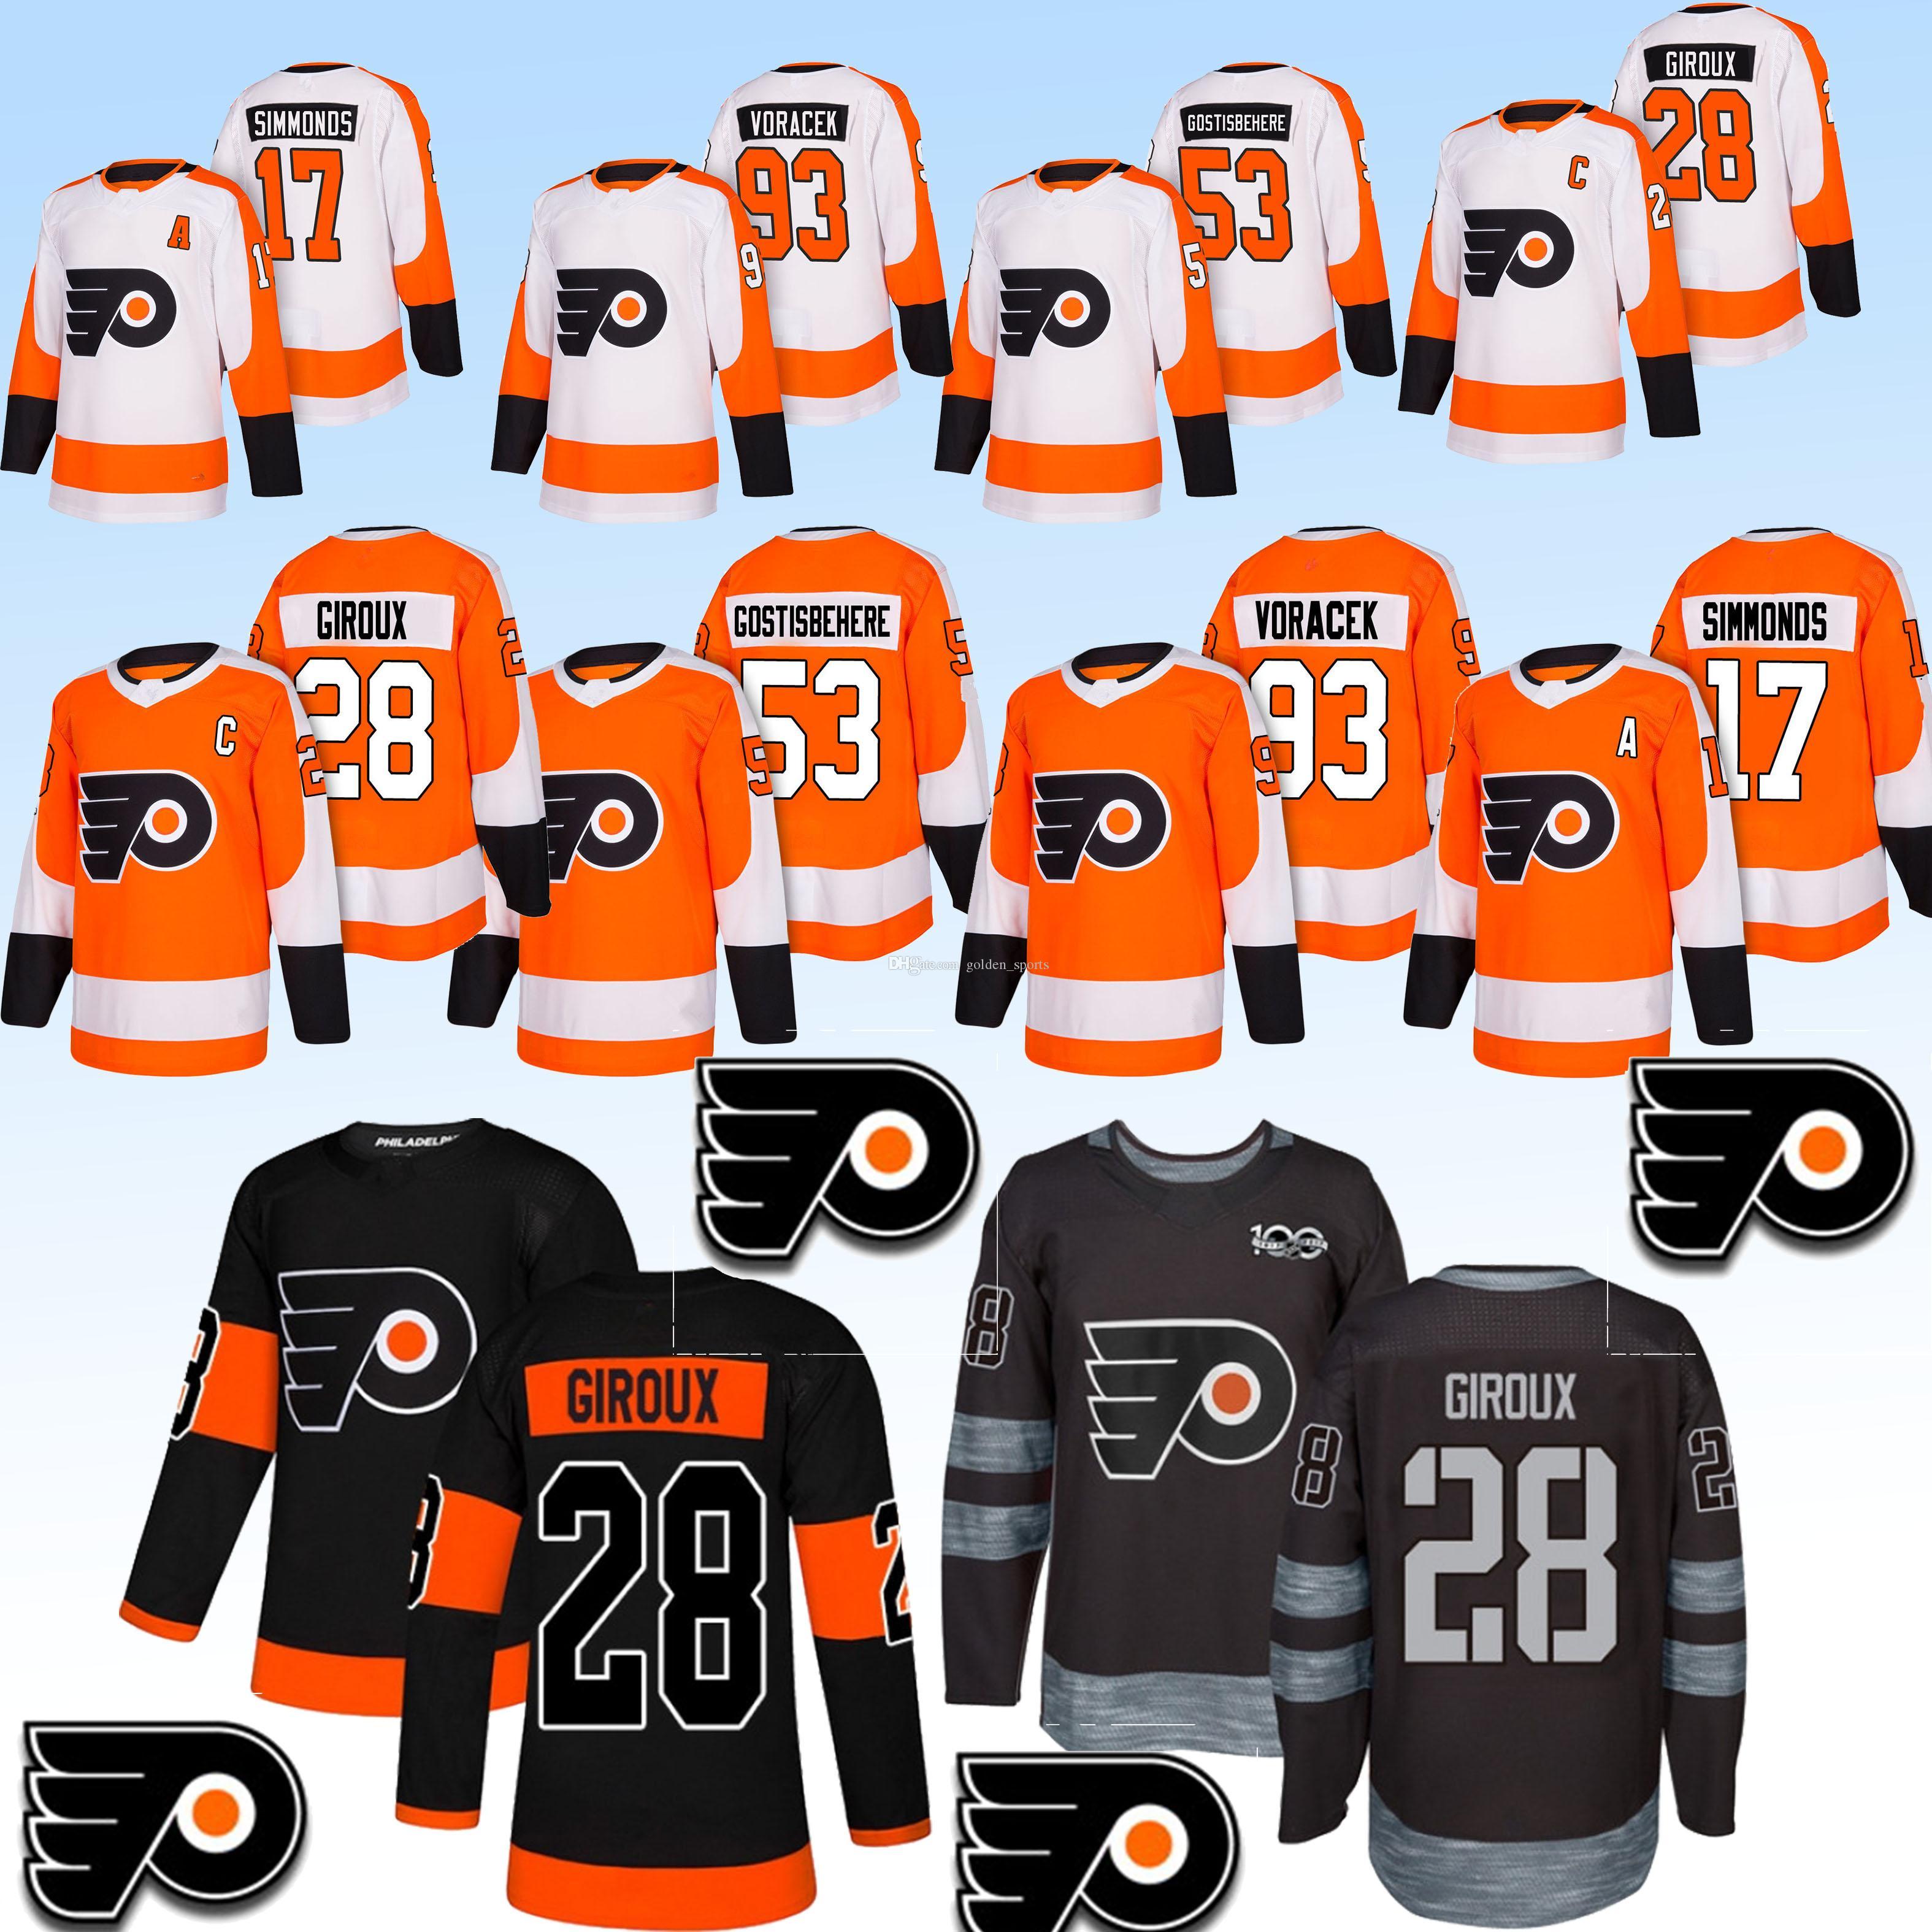 a09df7220ac 2019 Philadelphia Flyers Jerseys 9 Ivan Provorov 17 Wayne Simmonds 28  Claude Giroux 19 Nolan Patrick Ice Hockey Jersey Shirt Long Sleeves Top  From ...